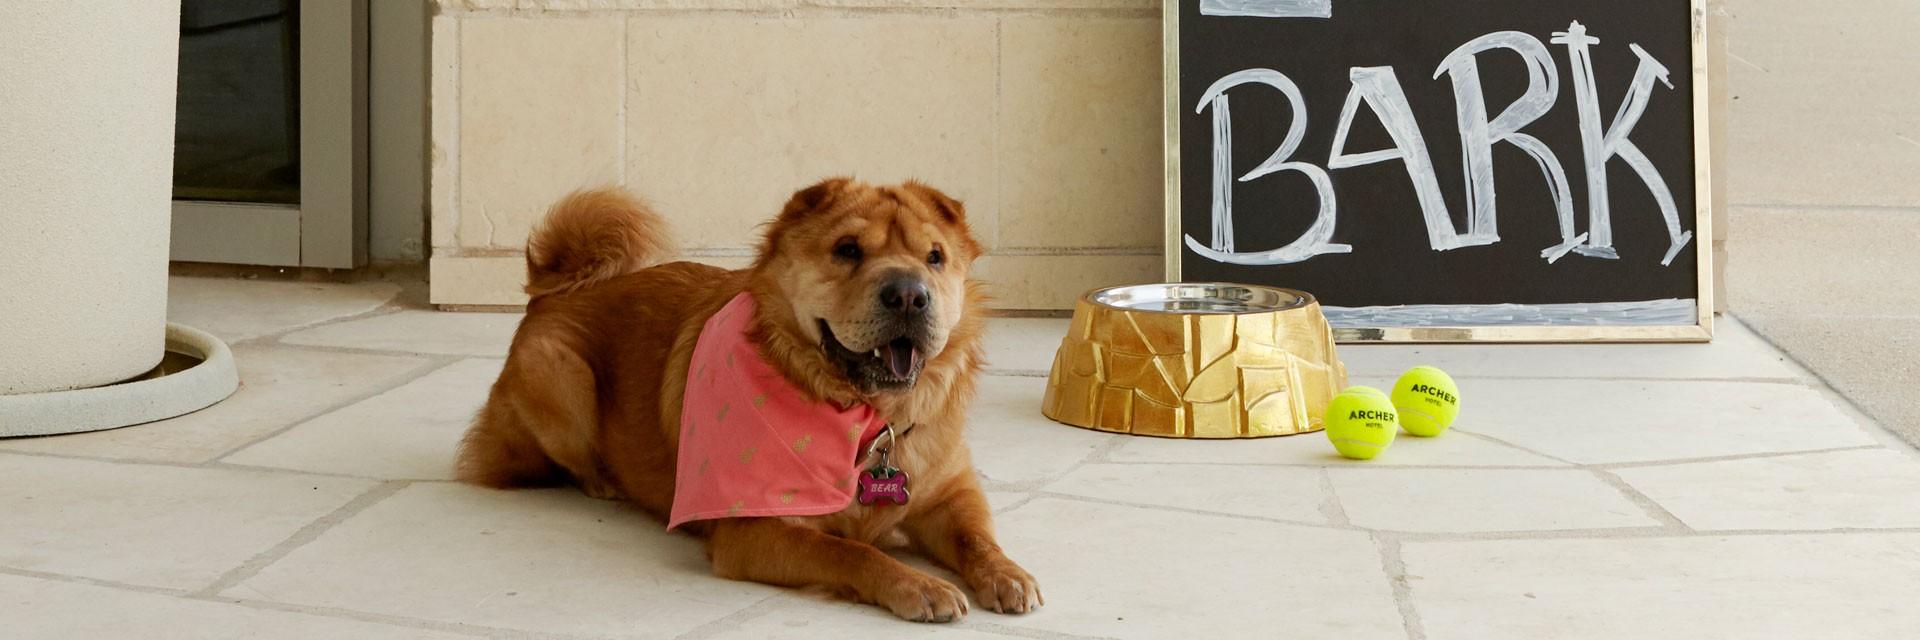 Archer Hotel Austin - Dog with food bowl